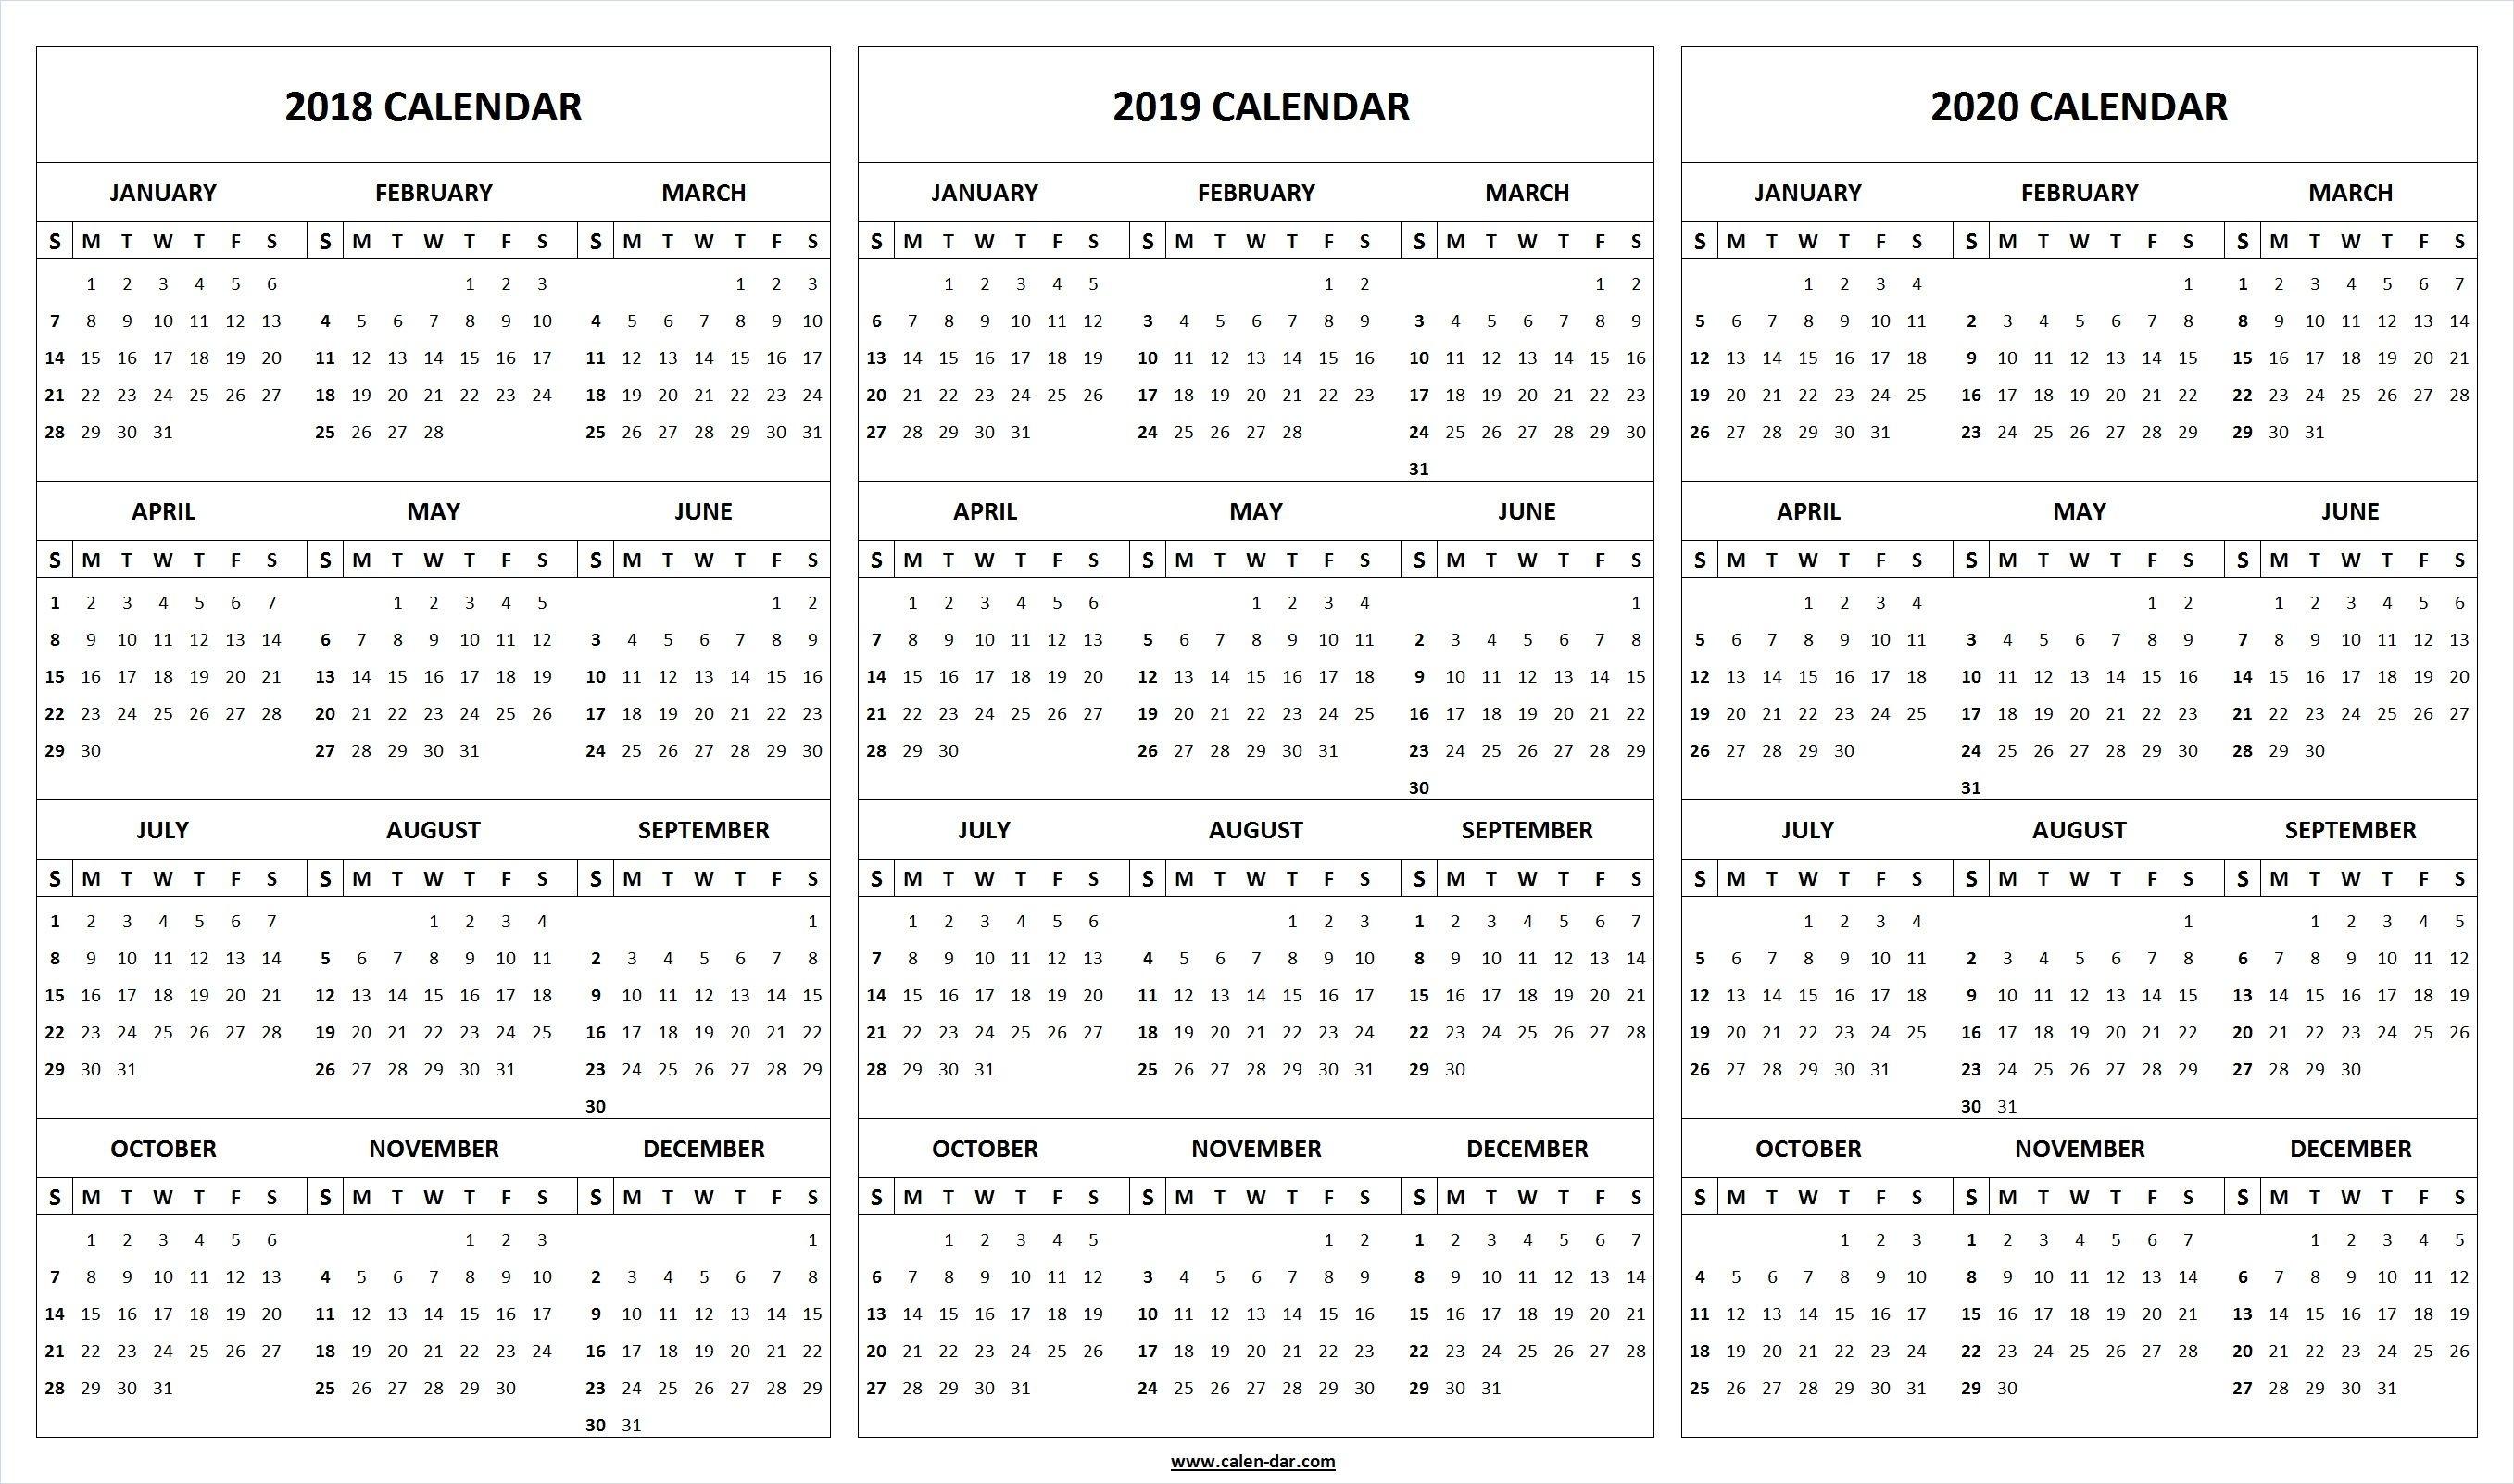 Print Blank 2018 2019 2020 Calendar Template | Organize! | Printable with 2020 Annual Calendar Blank